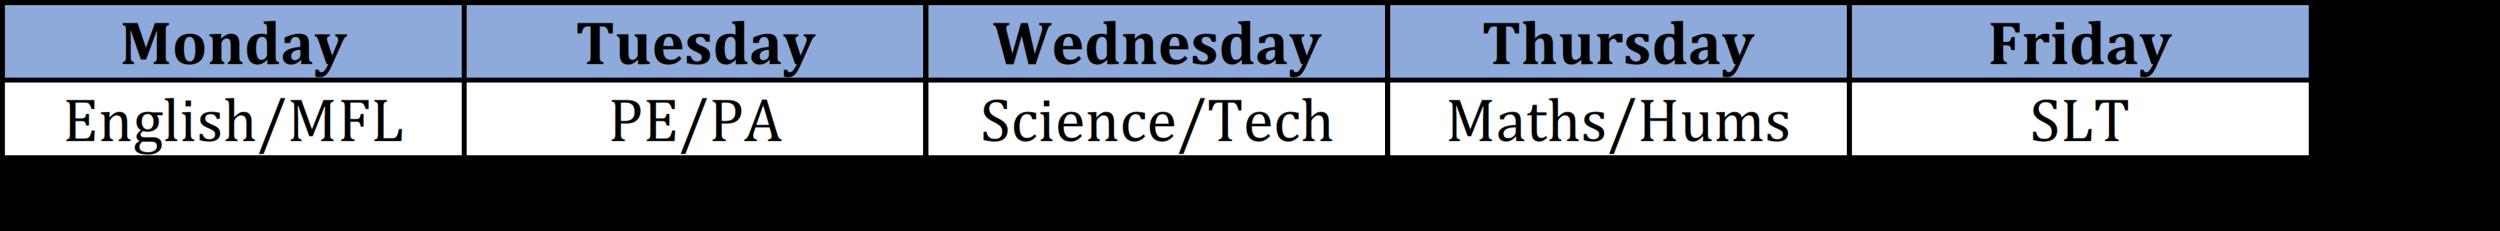 Homework-Timetable.png